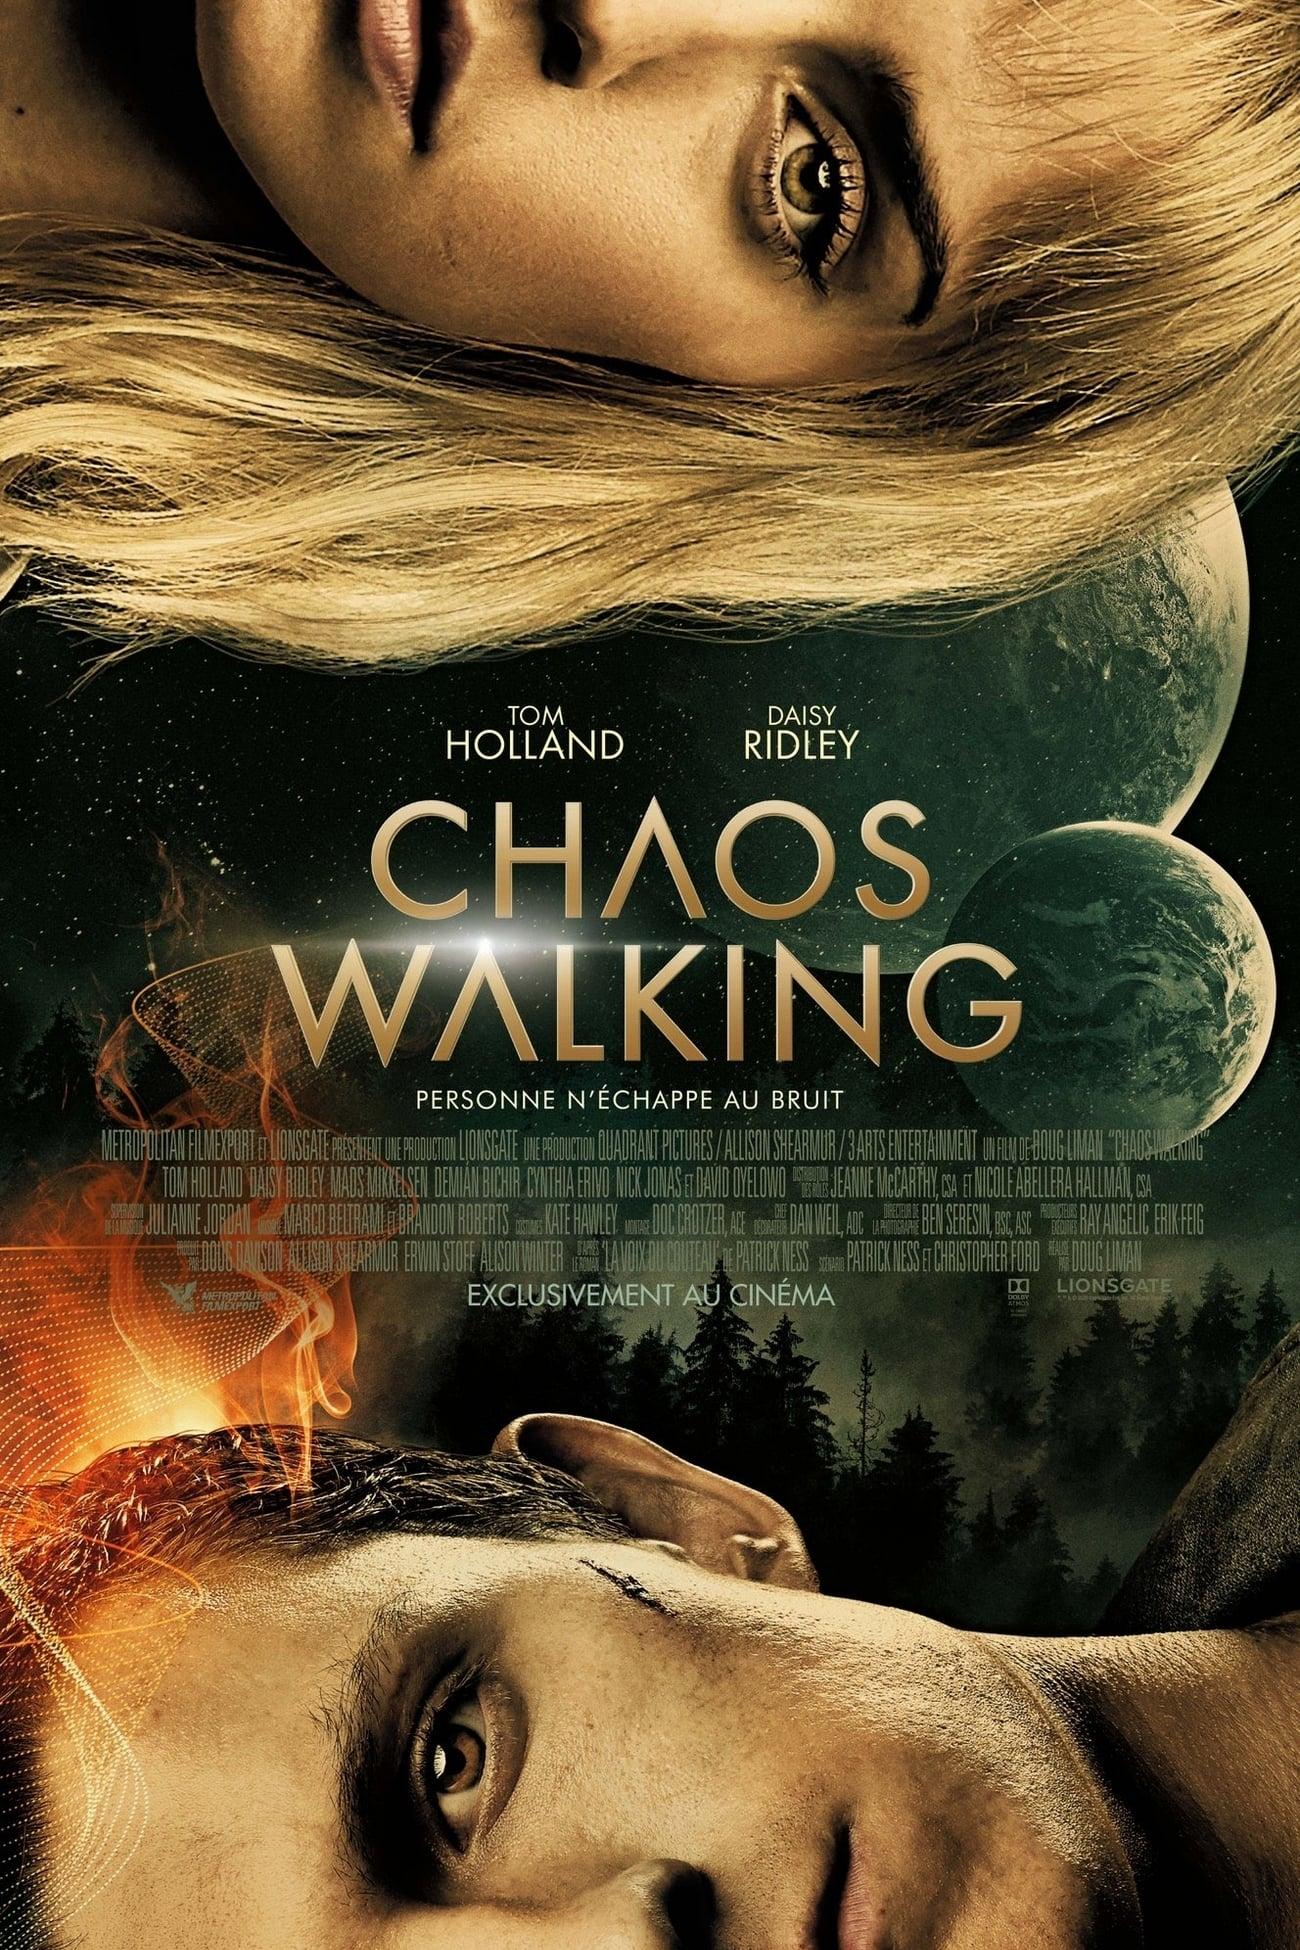 Chaos Walking streaming sur zone telechargement